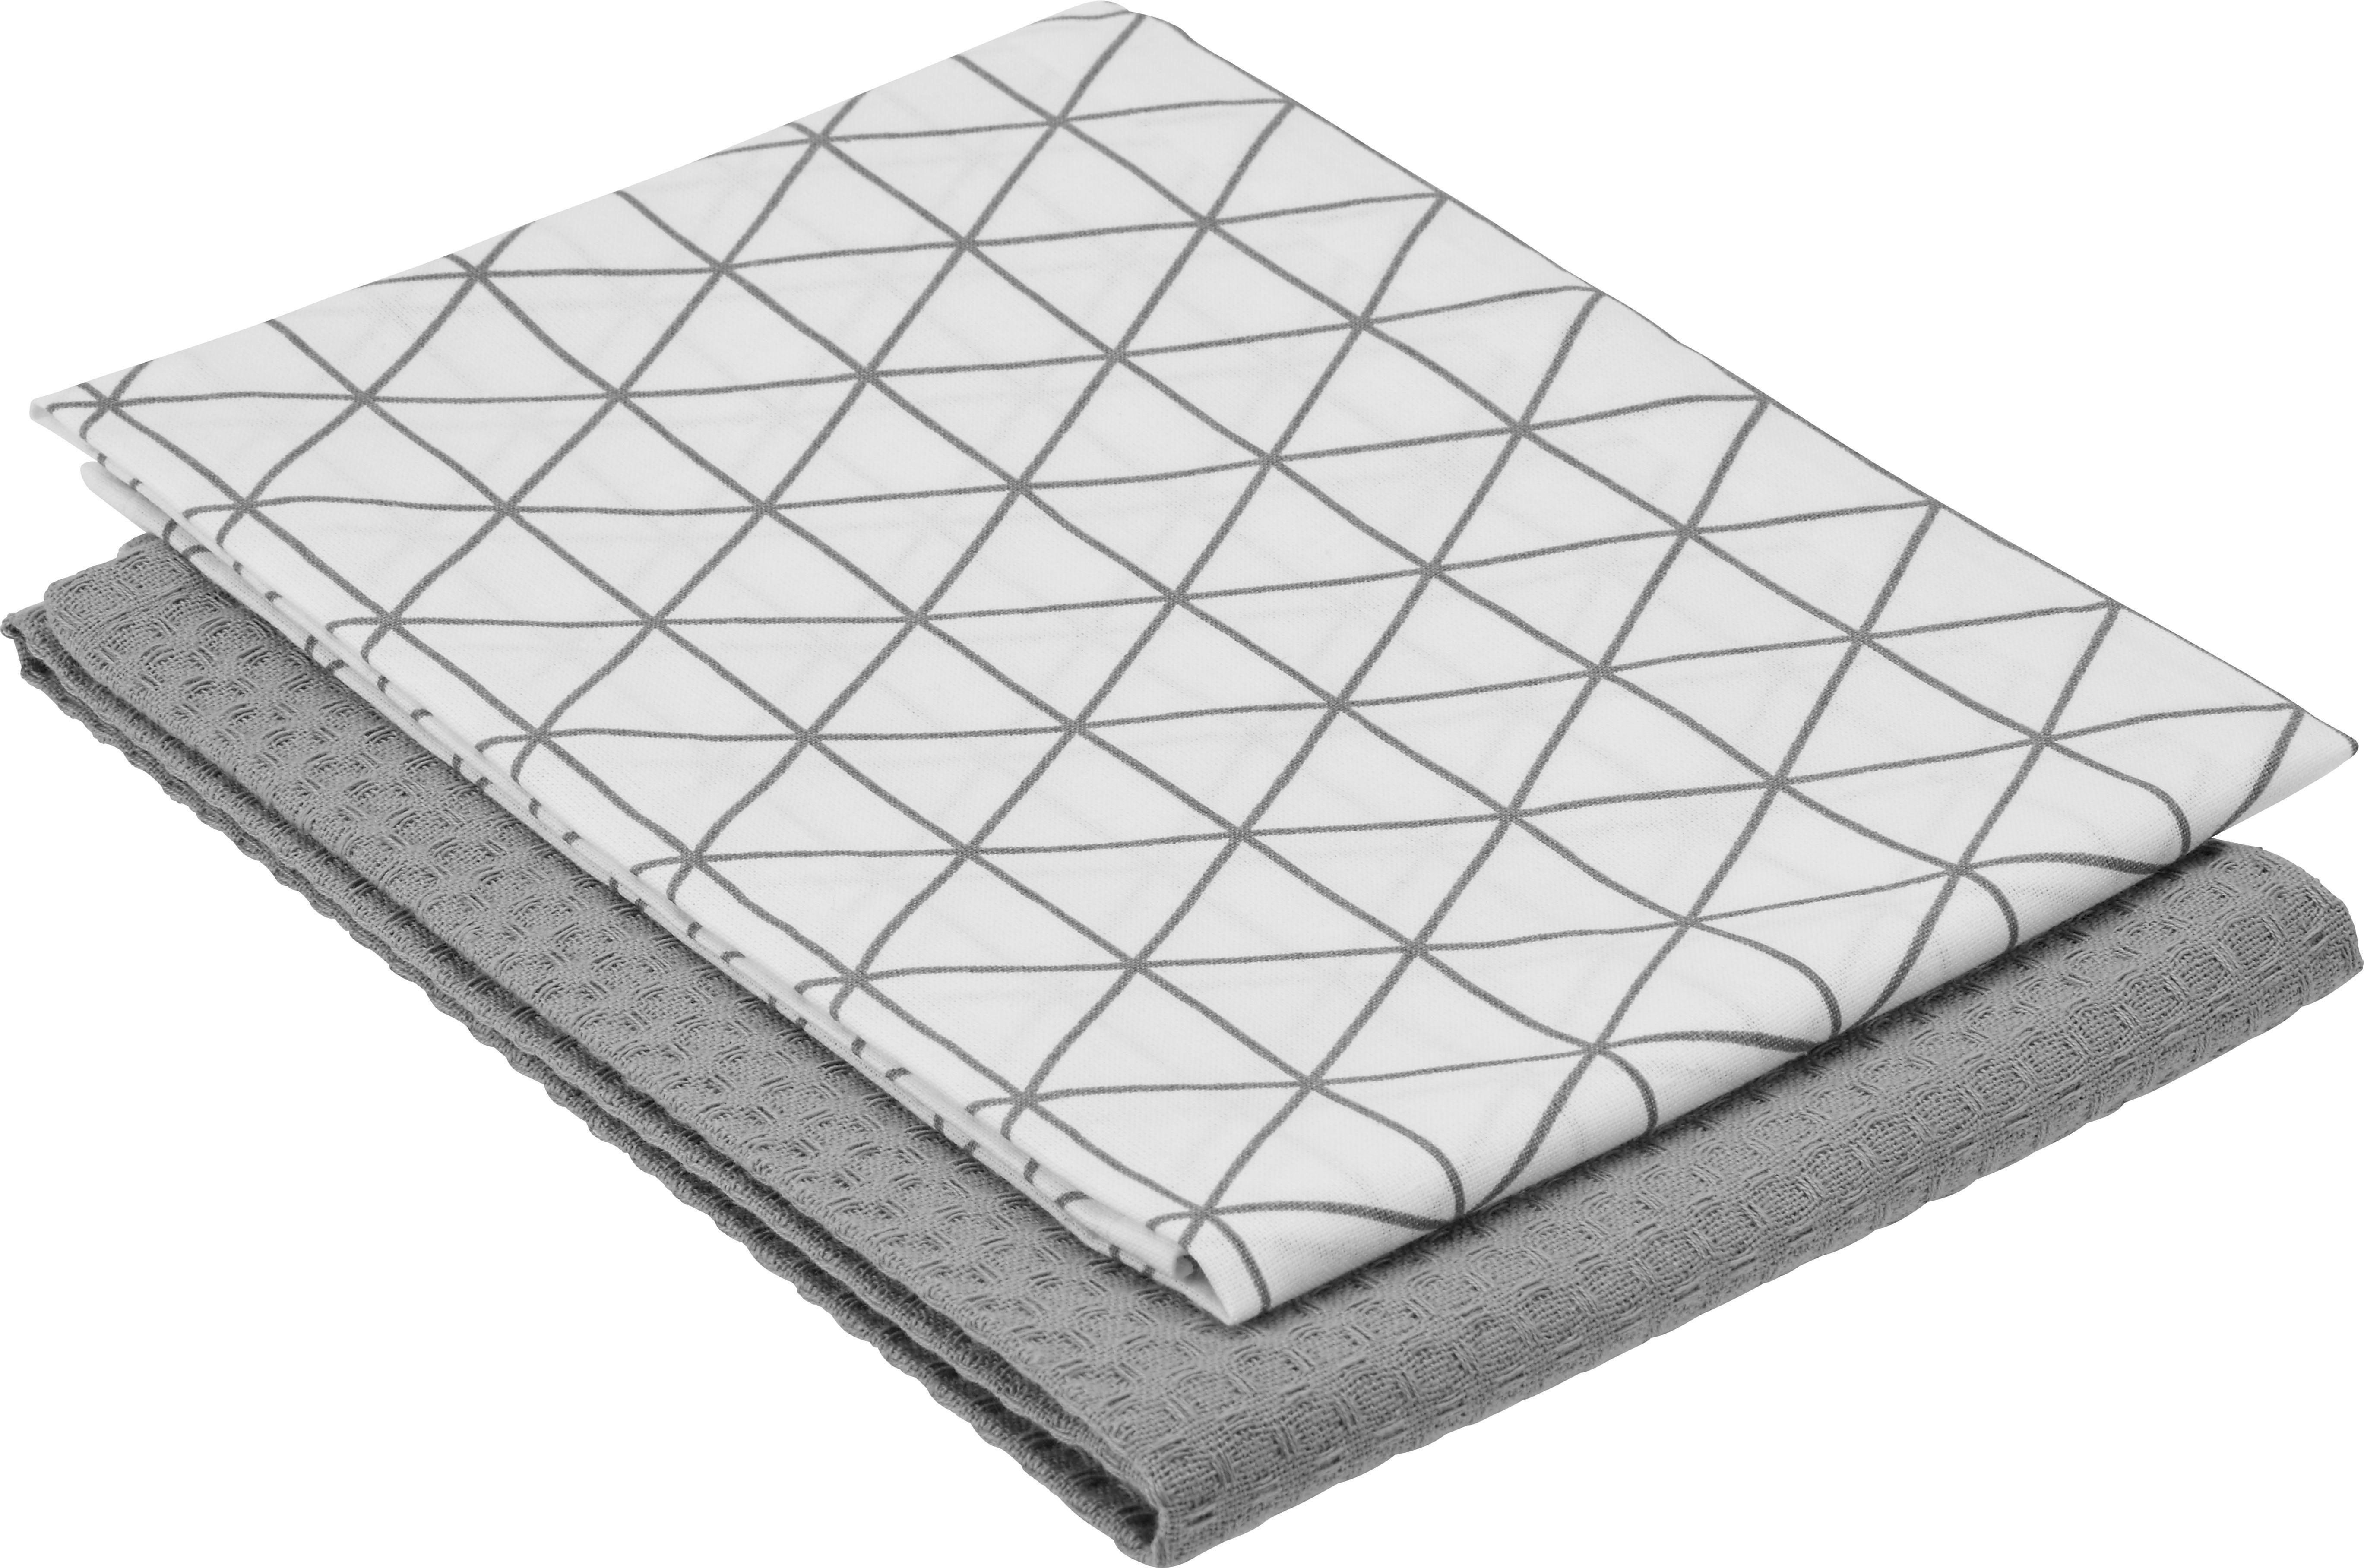 Geschirrtuch Kathi ca. 50x70cm - Grau, Textil (50/70cm) - MÖMAX modern living